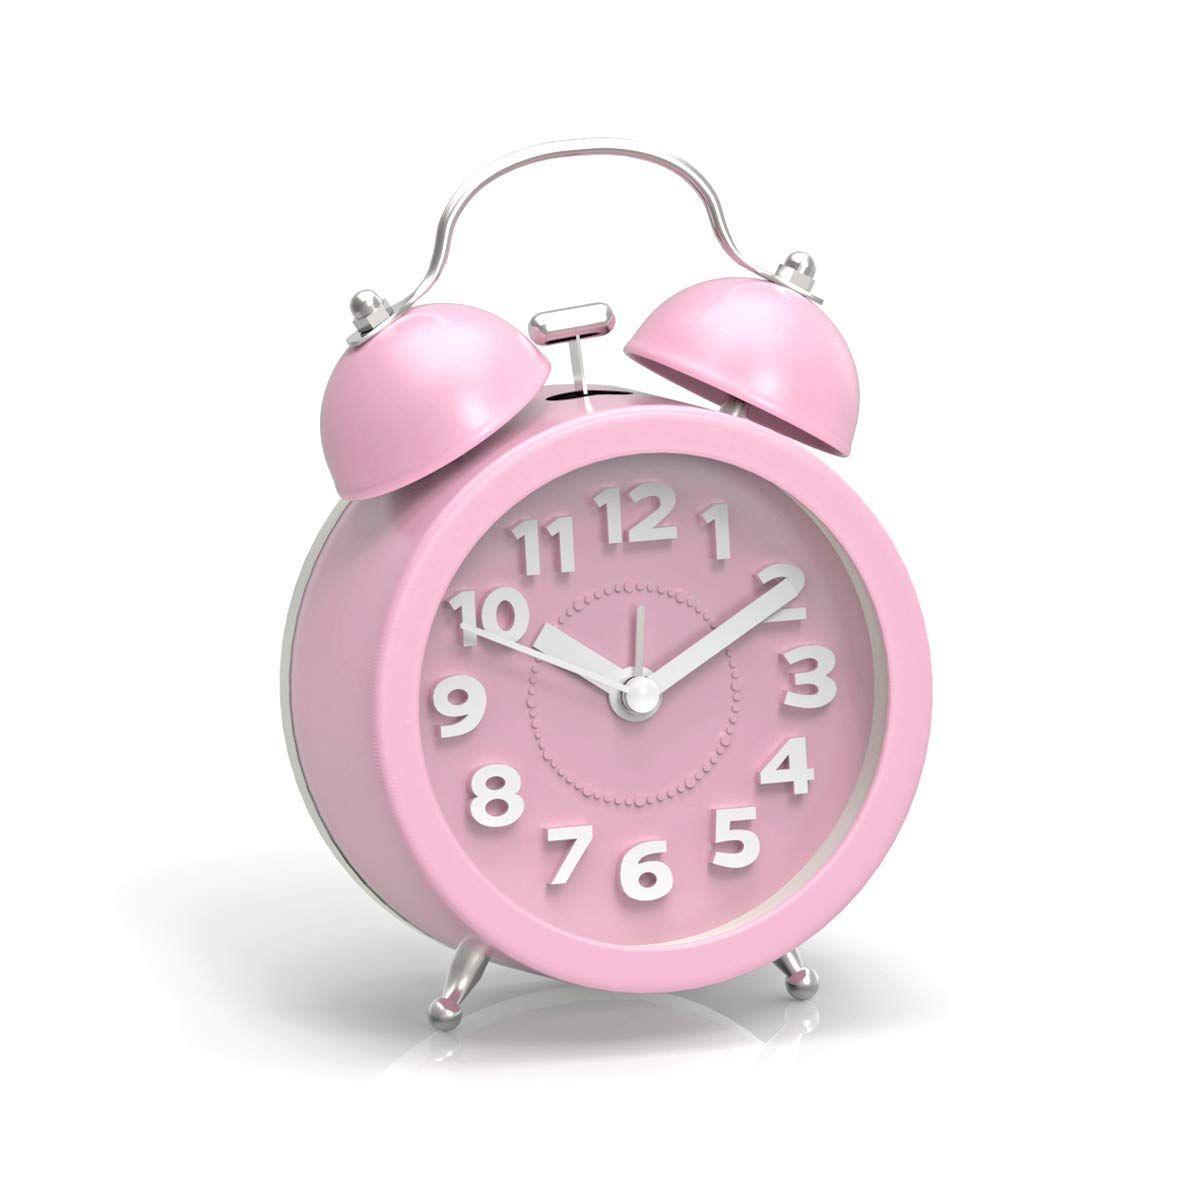 In Pink Analog Alarm Clock Alarm Clock Clock For Kids